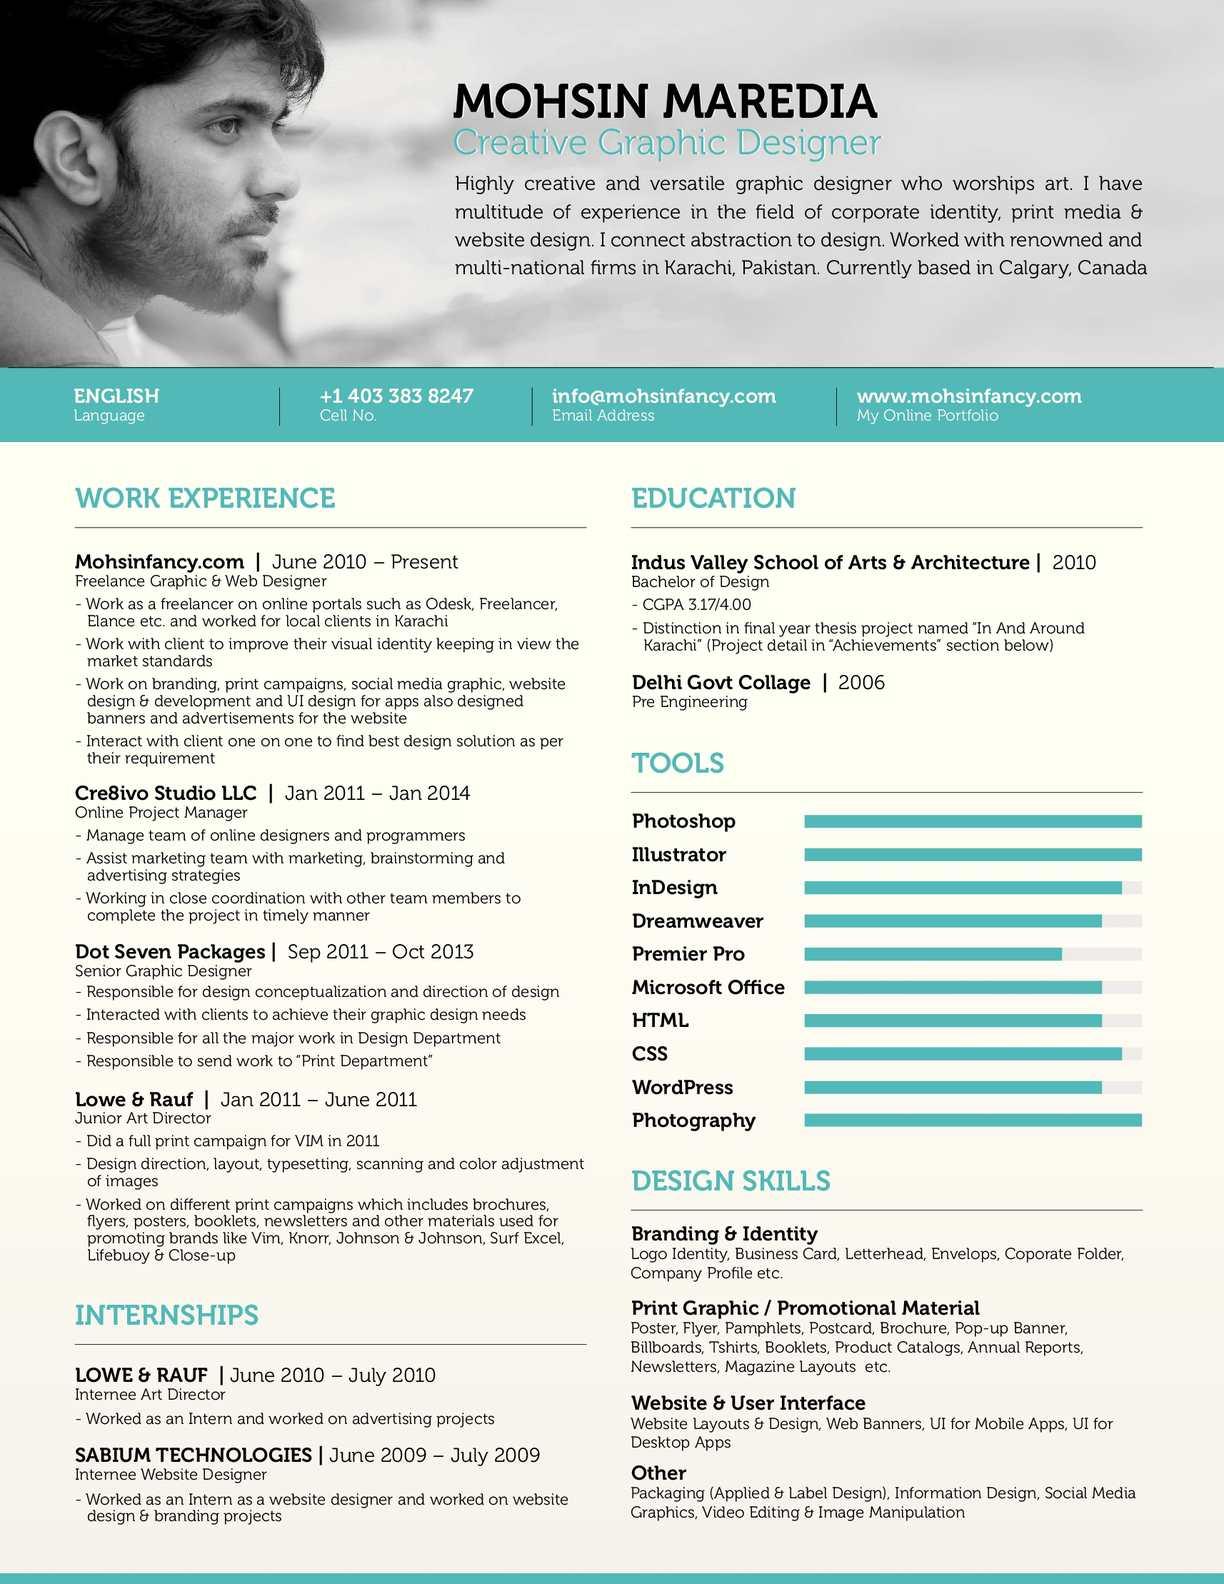 Ca phd publication resume services web